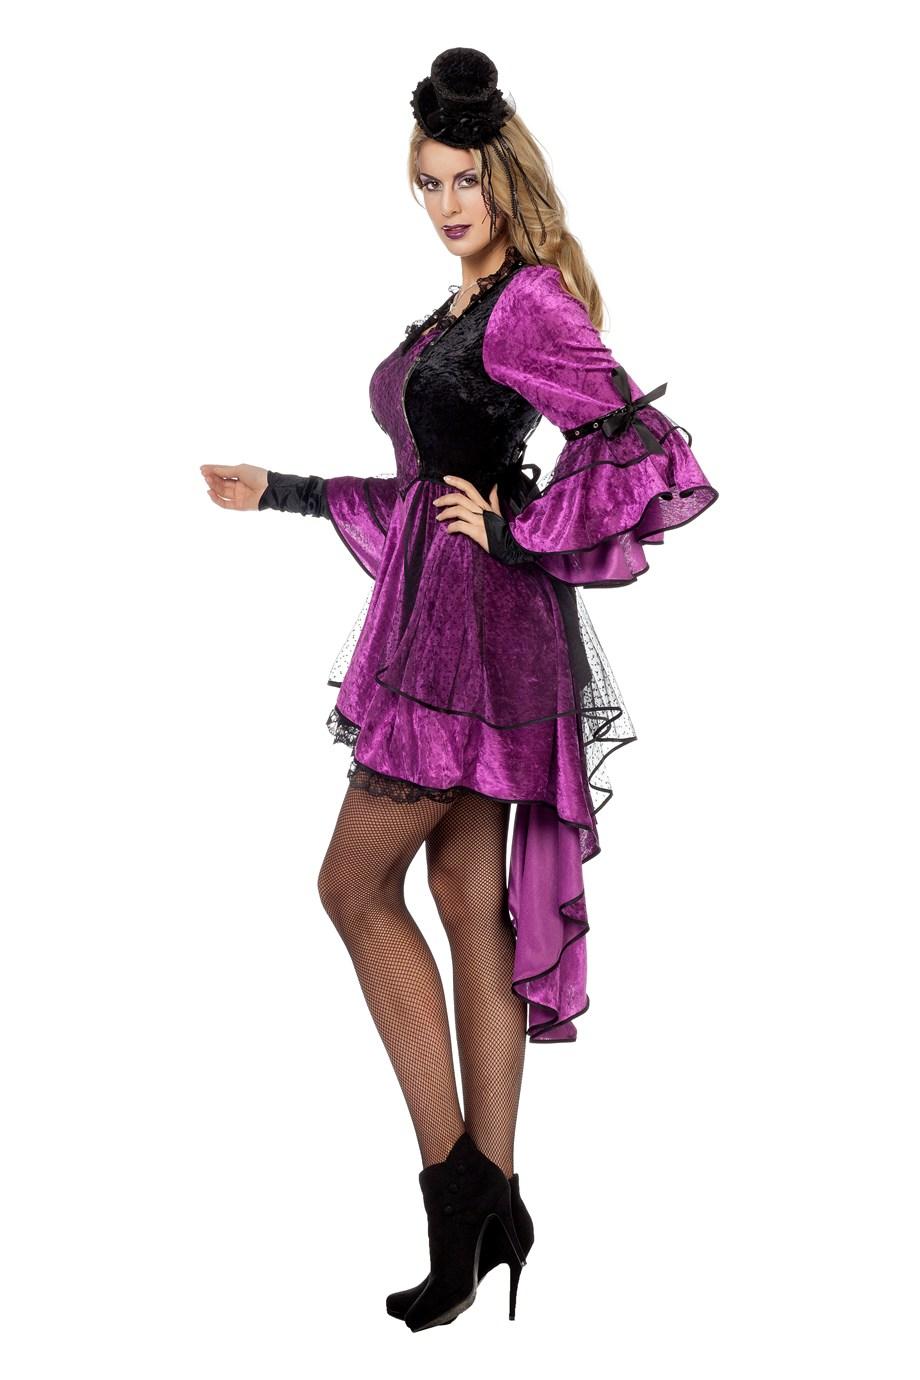 Gothic jurk paars voor dame